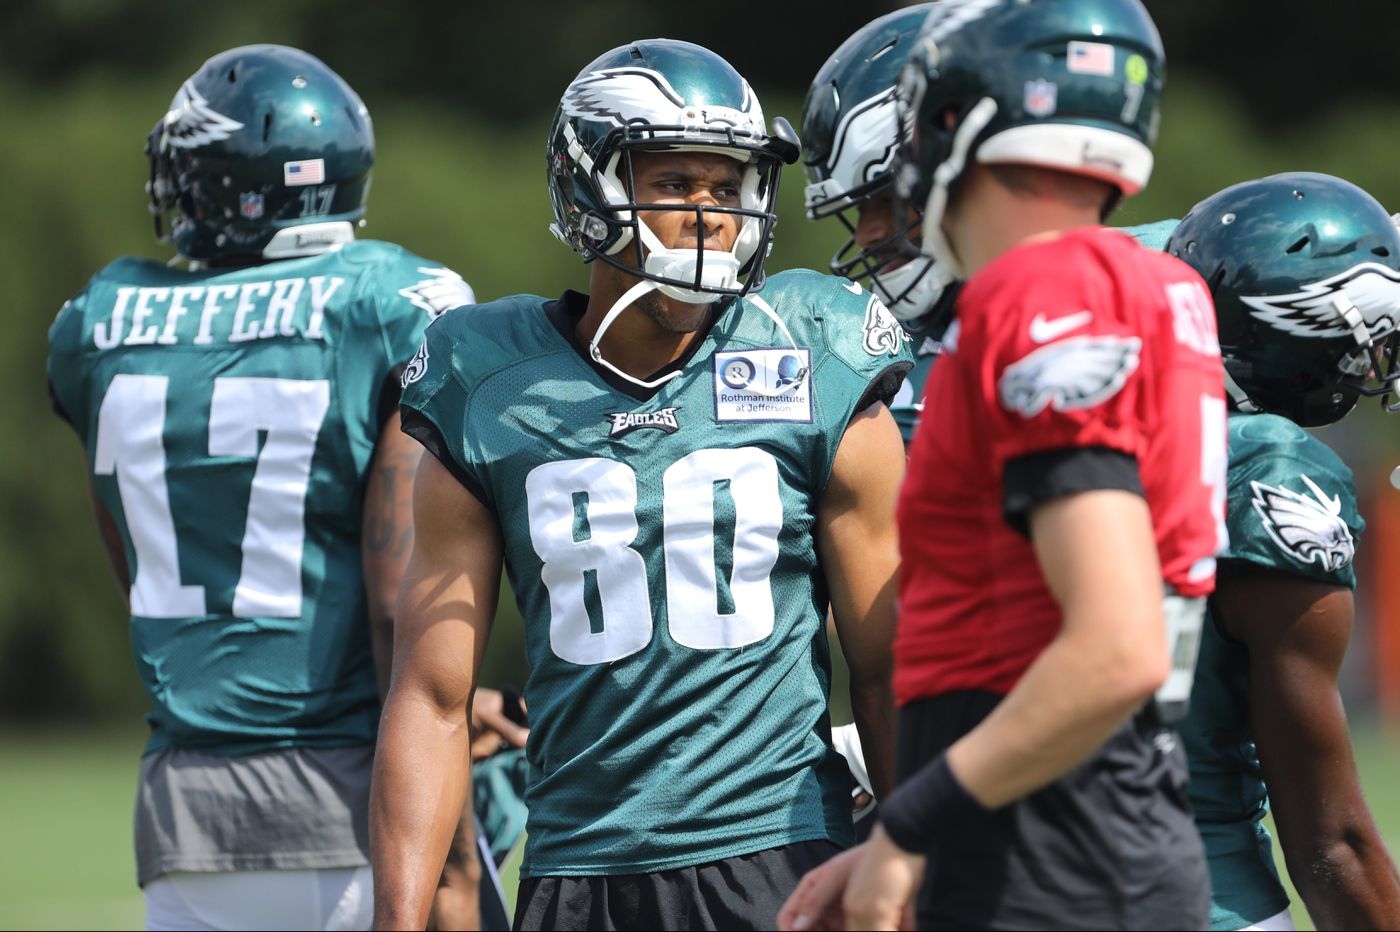 Carson Wentz, Jordan Matthews back together as Eagles